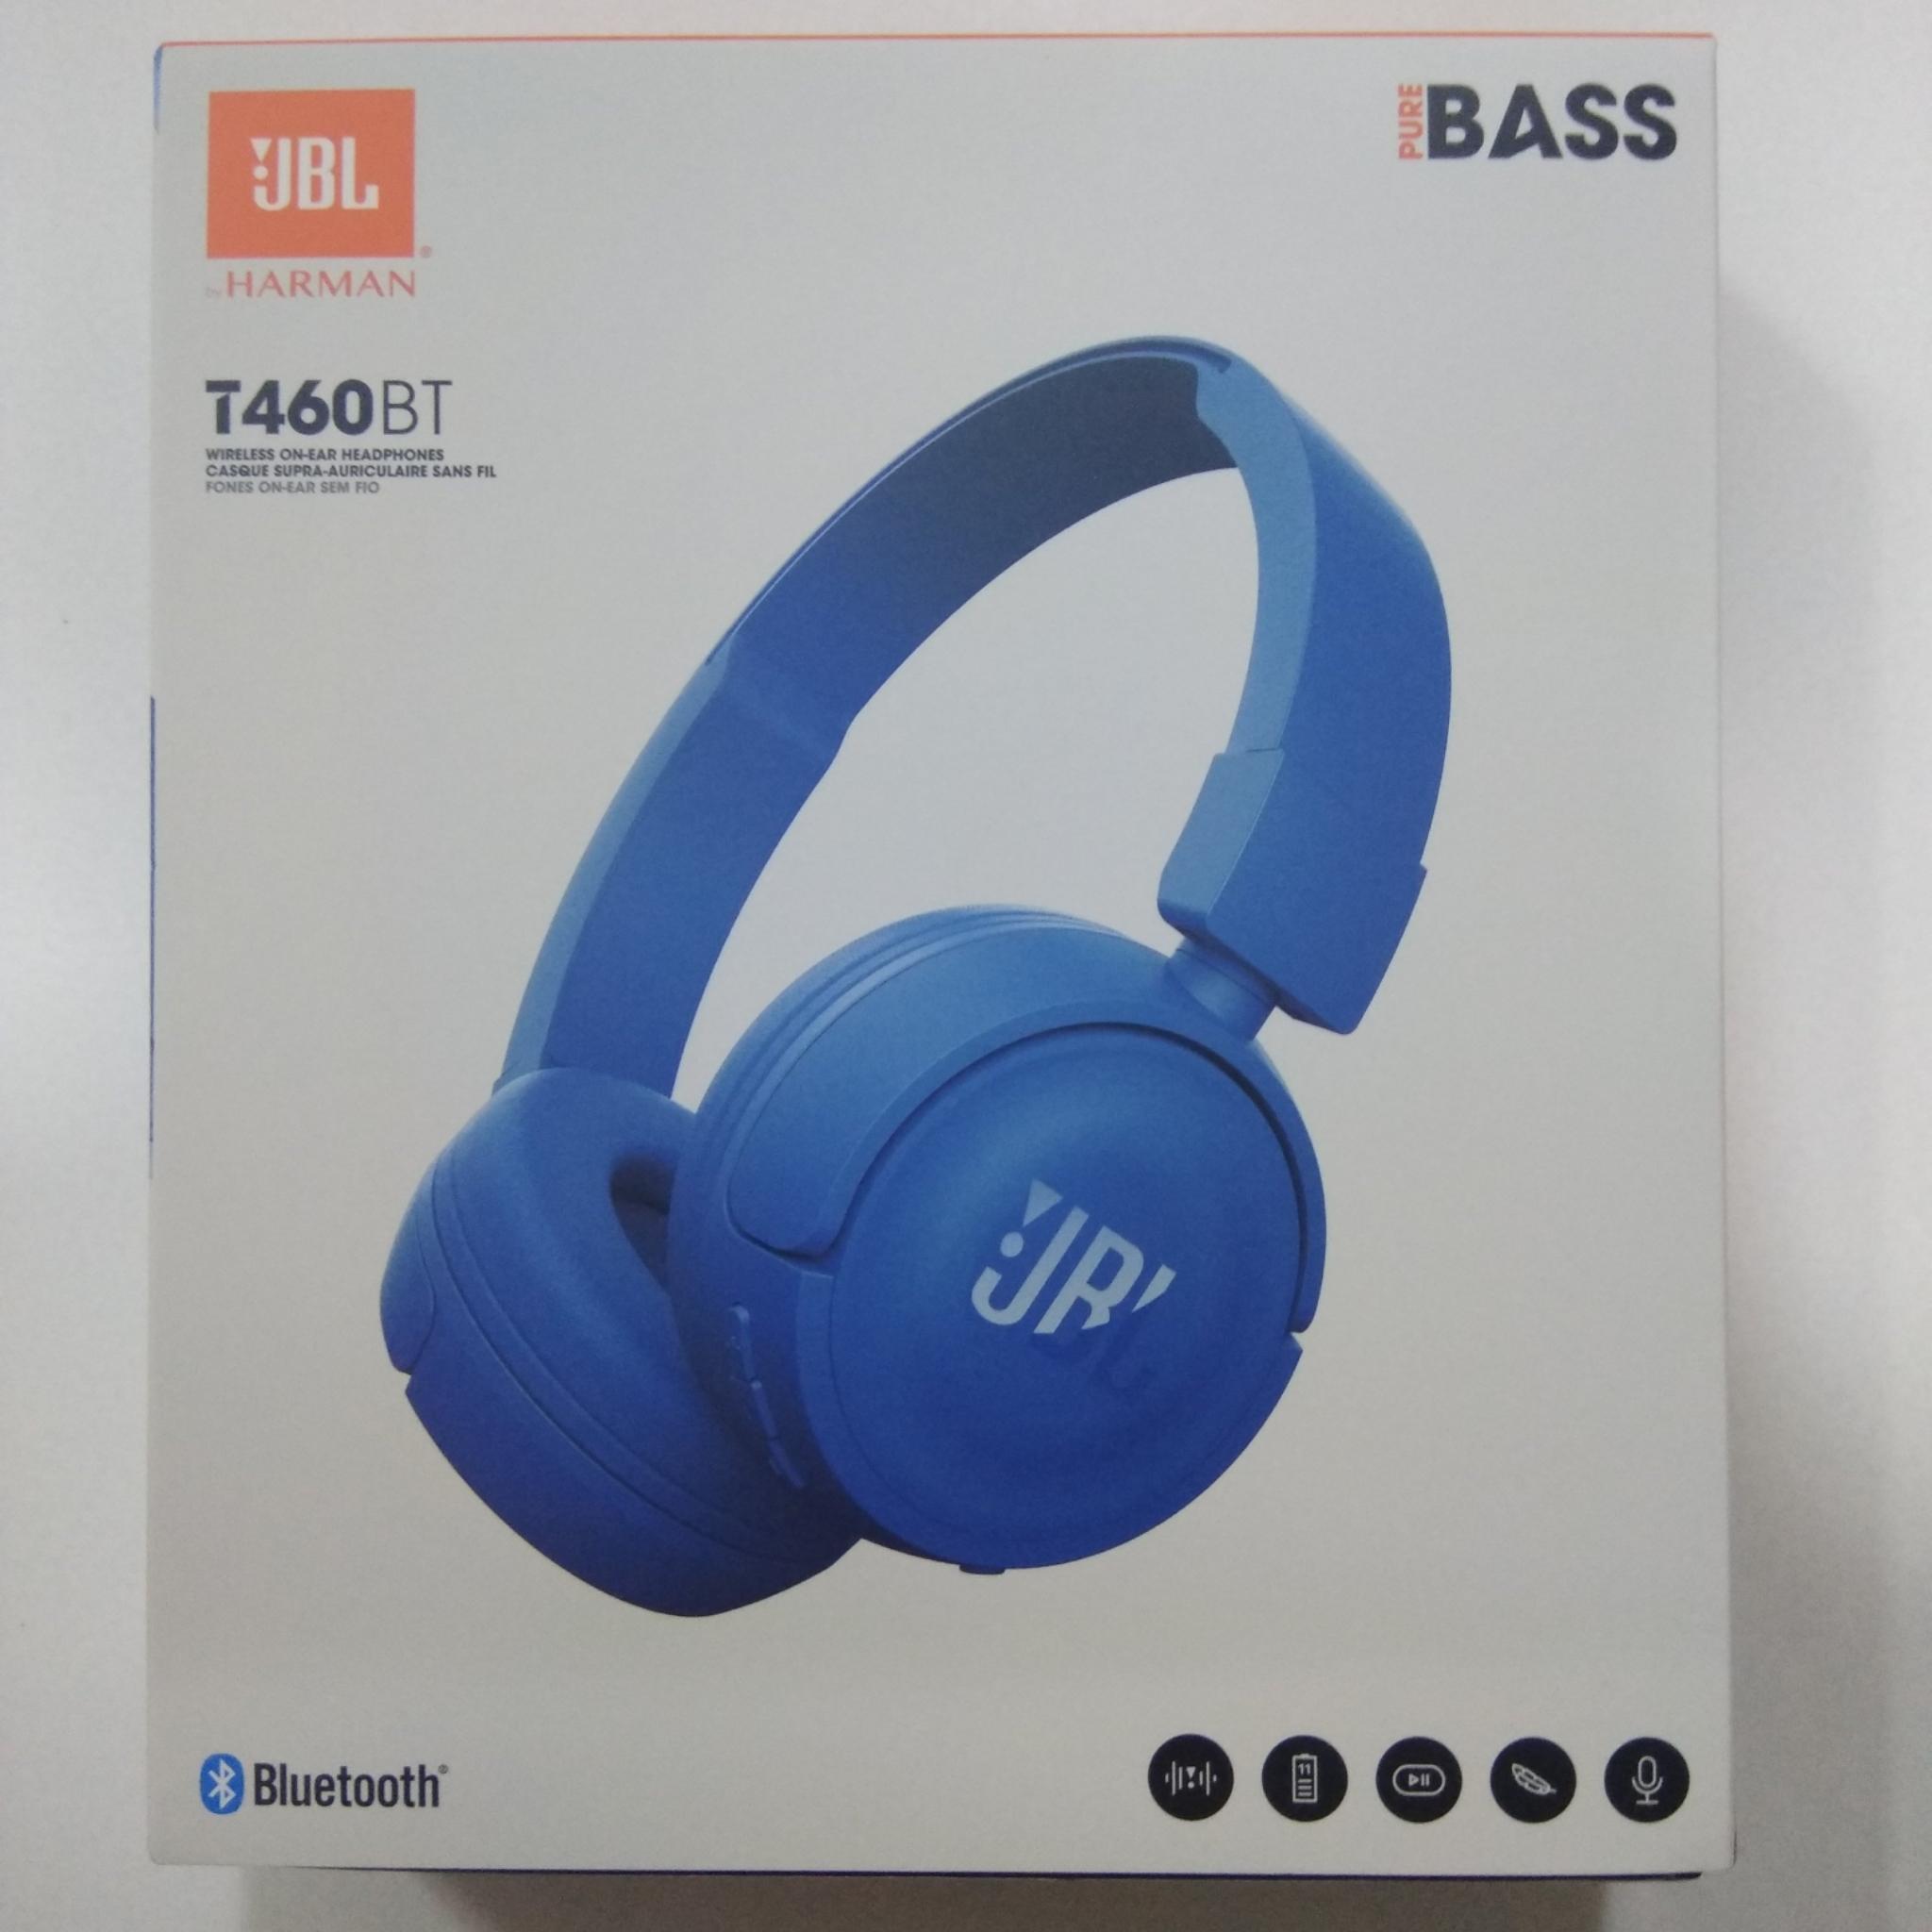 JBL T460BT Wireless Bluetooth on-ear headphones, Blue T460BT-Blue HSN:85183000